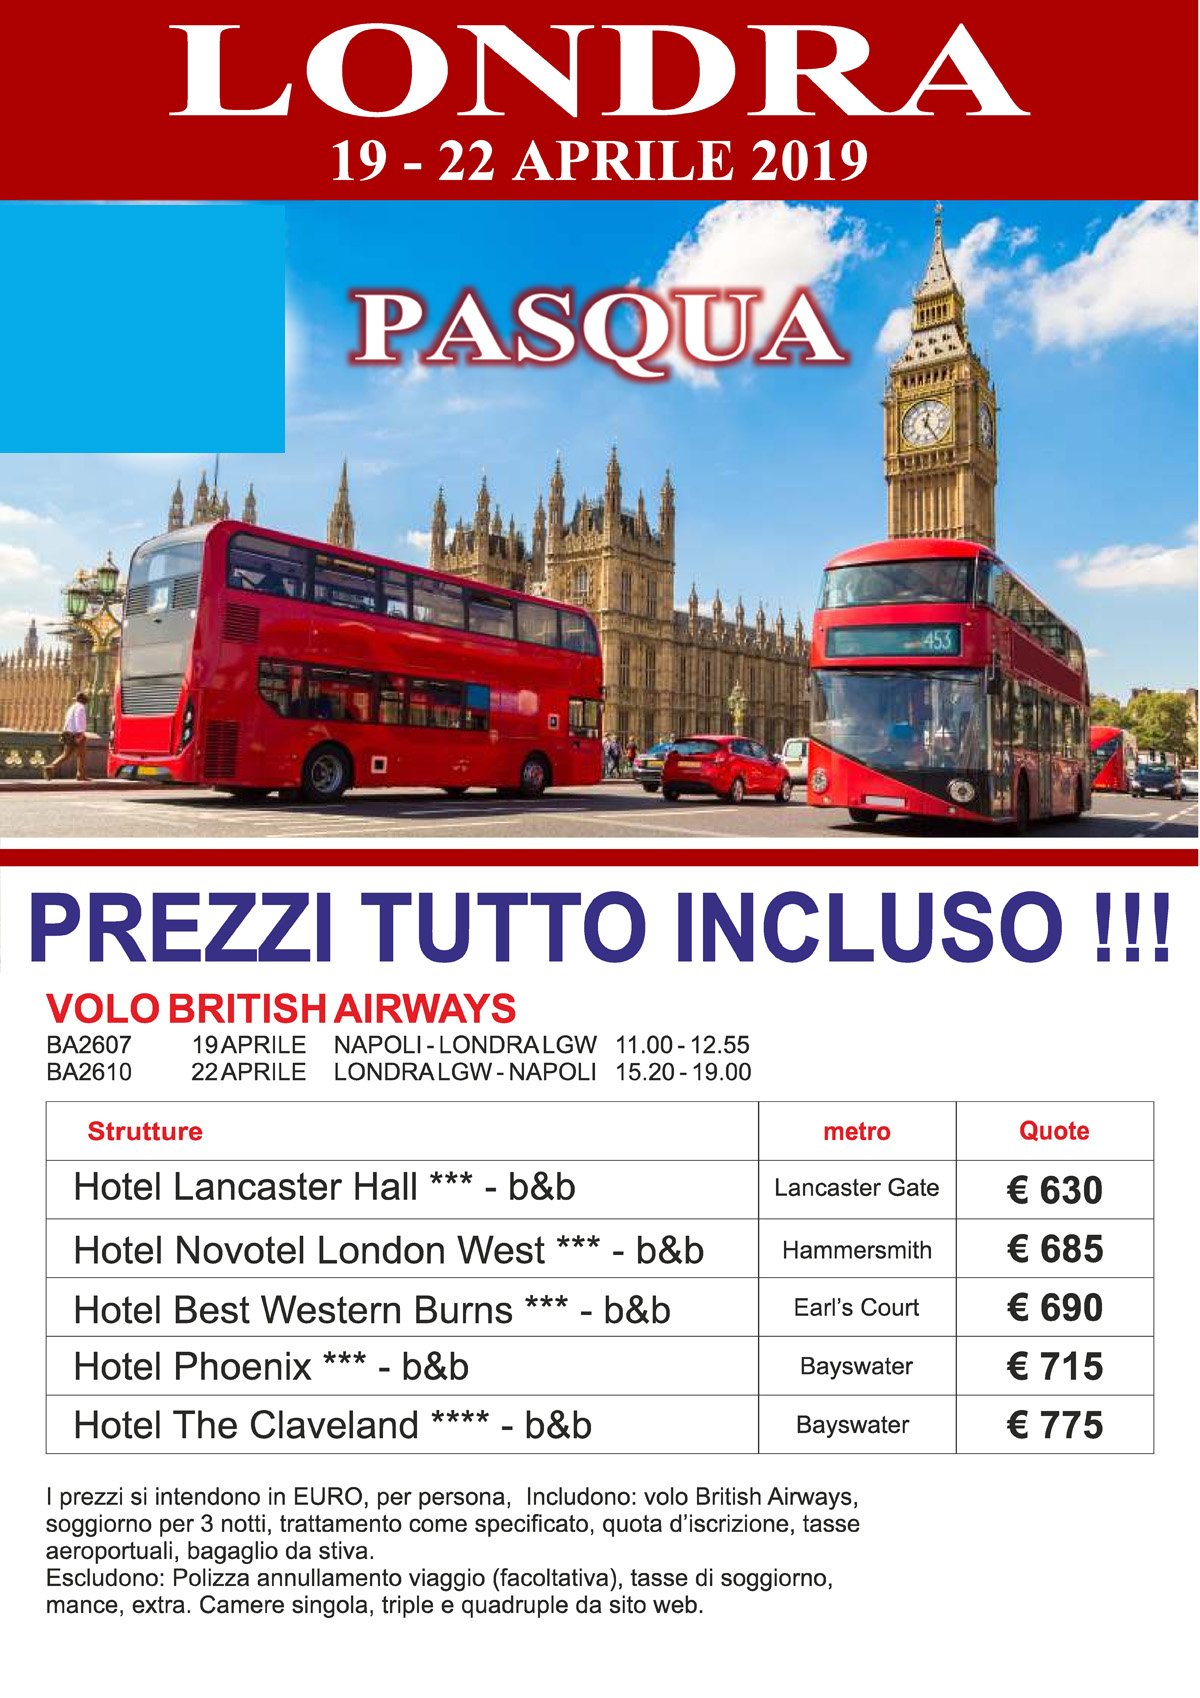 Pasqua LONDRA – Offerte Last Minute